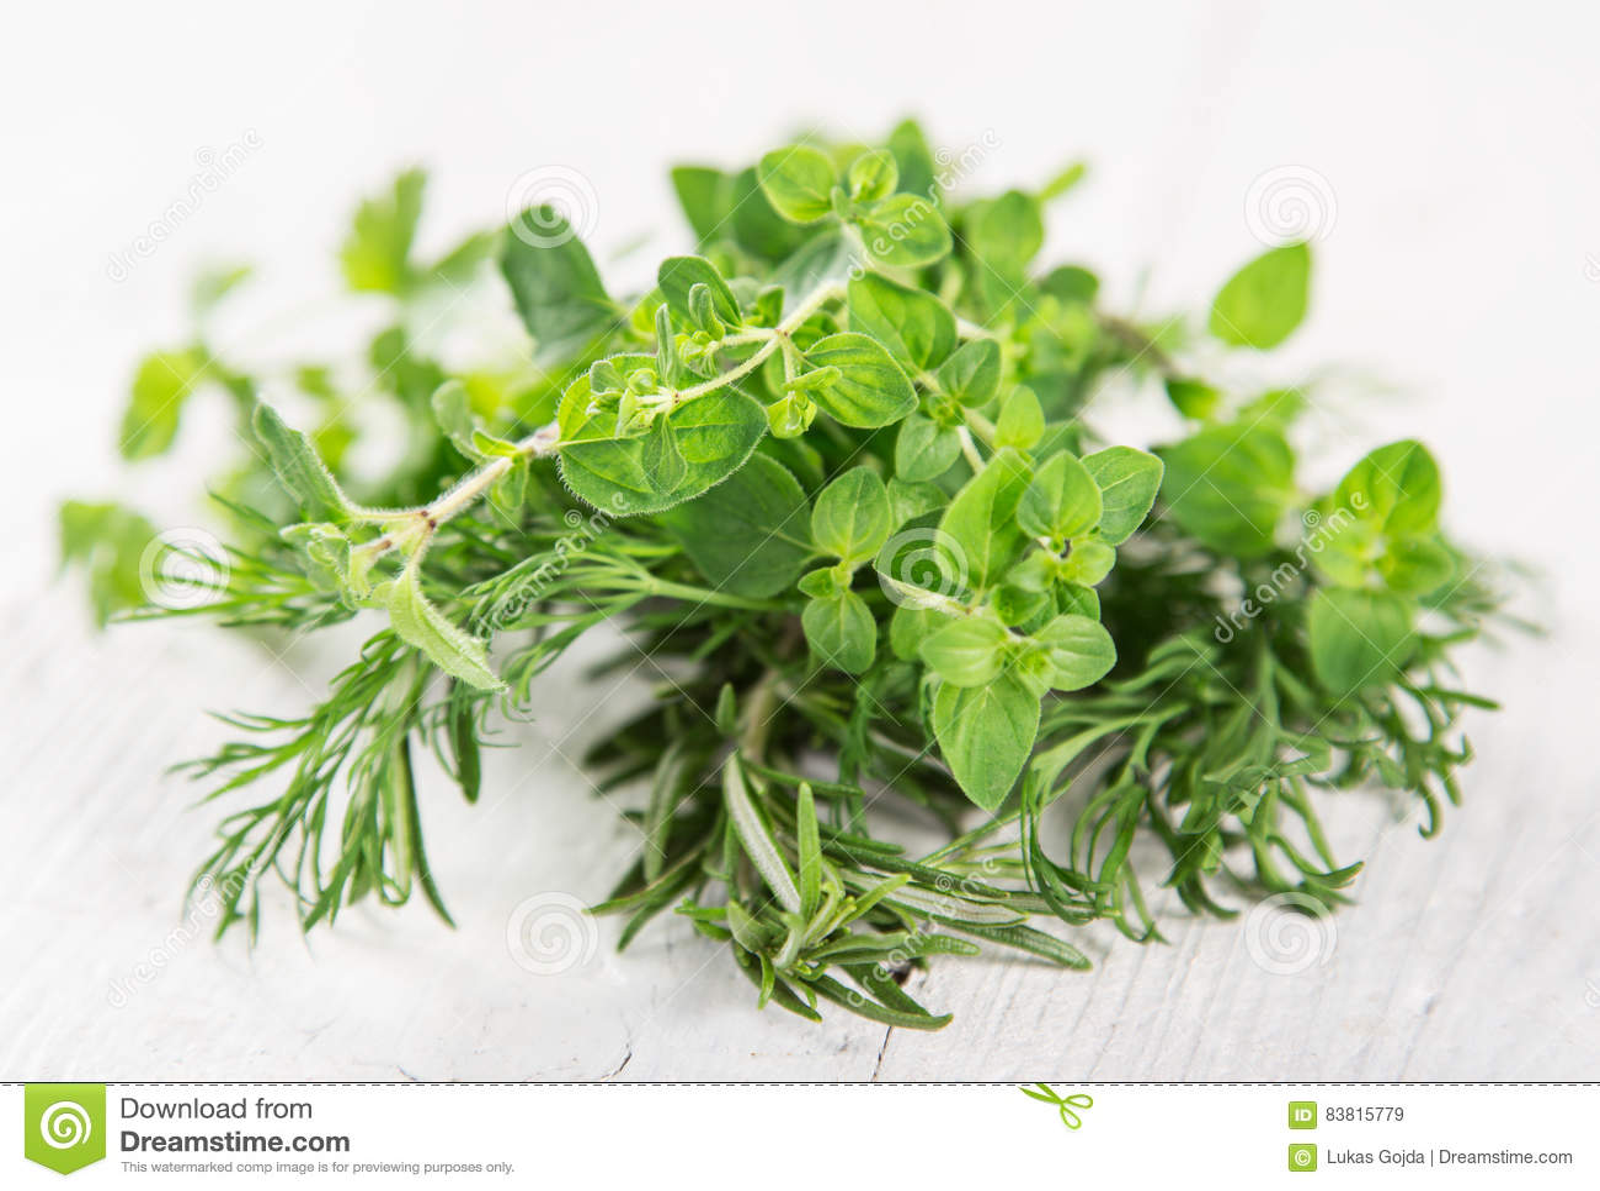 Vario genere di erbe fresche